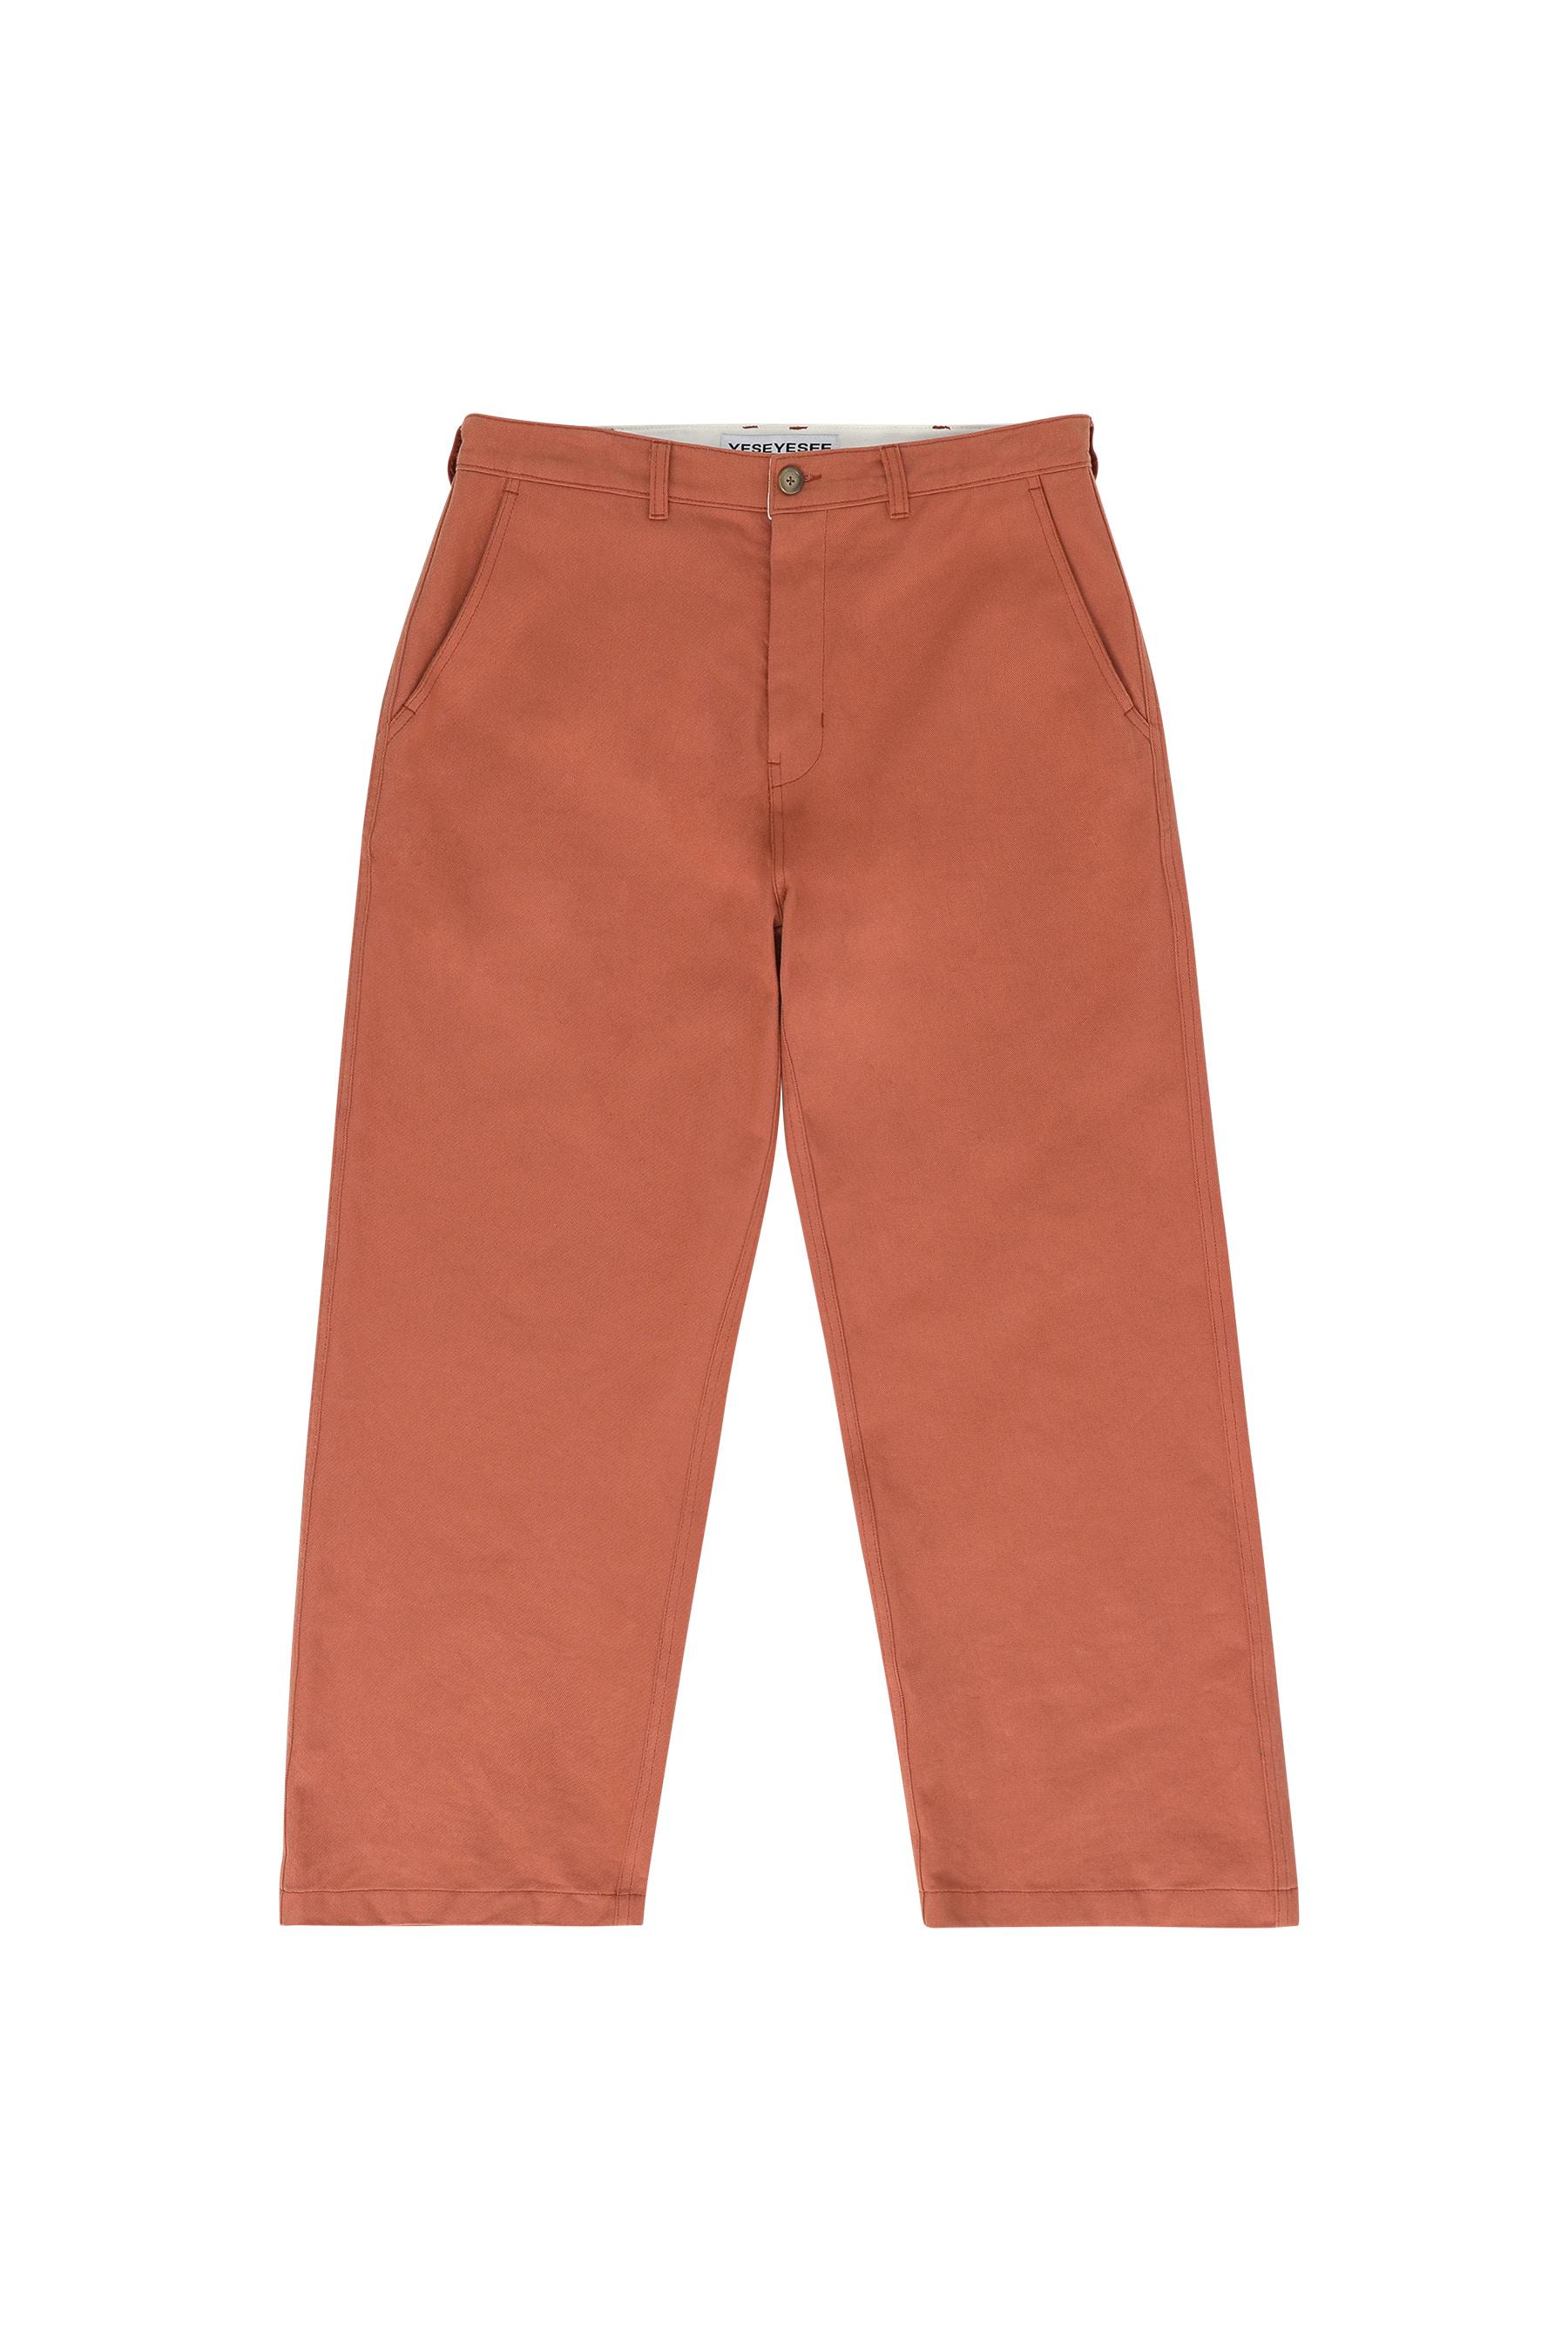 Cotton Twill Pants Rust